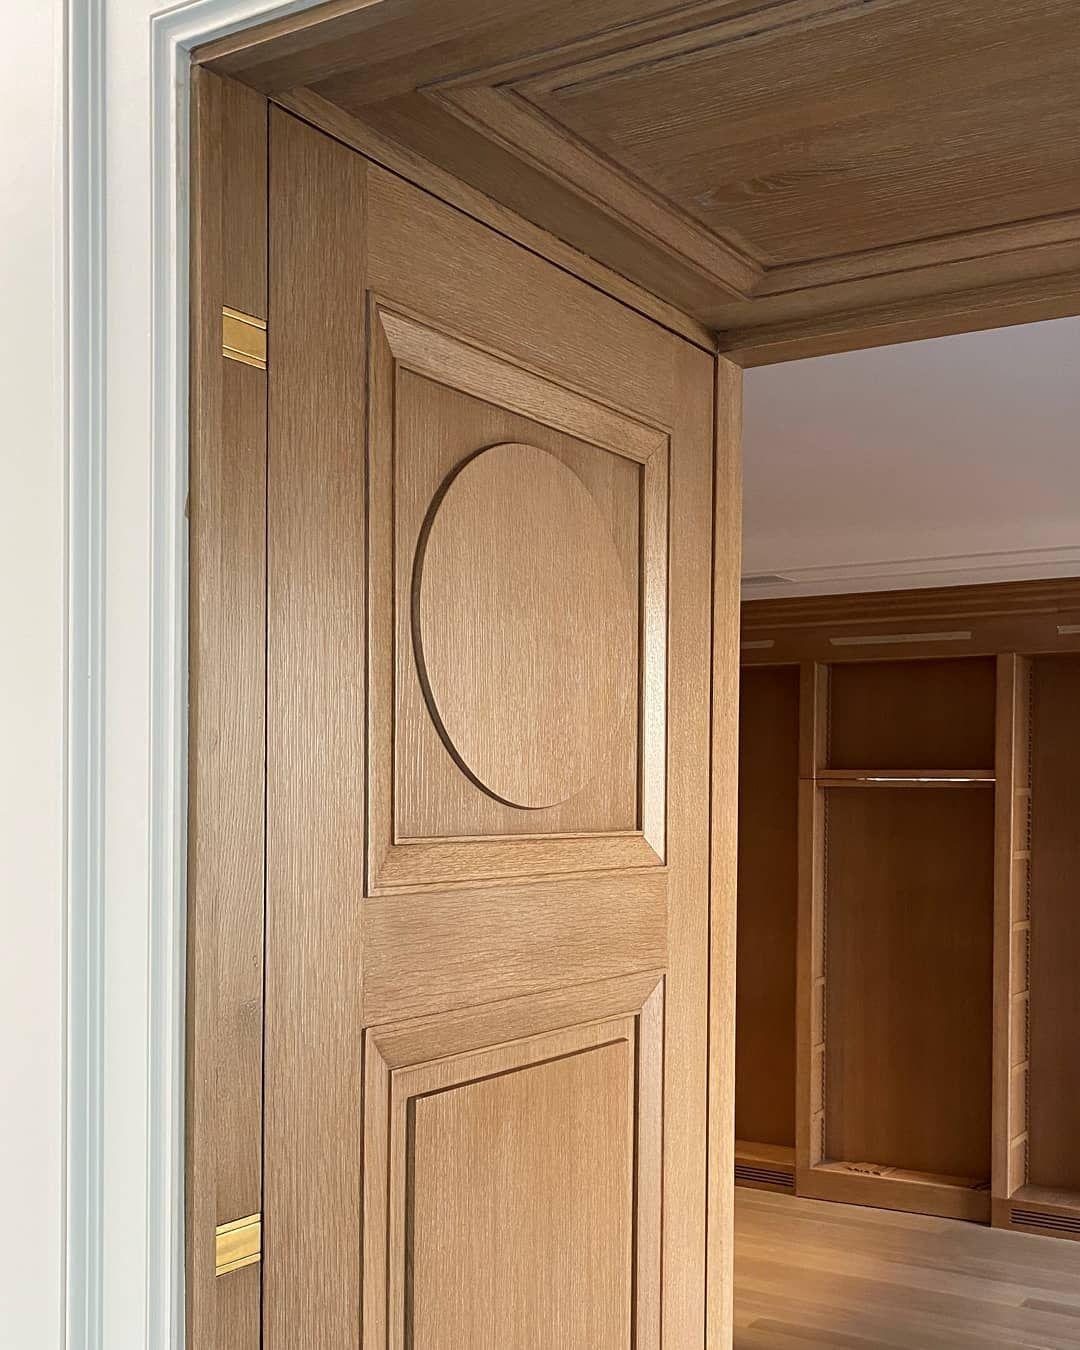 bmc interior doors on custom white oak door with circle panel detail and brass hardware bmc design ultra team custom entry doors oak doors custom built ins custom entry doors oak doors custom